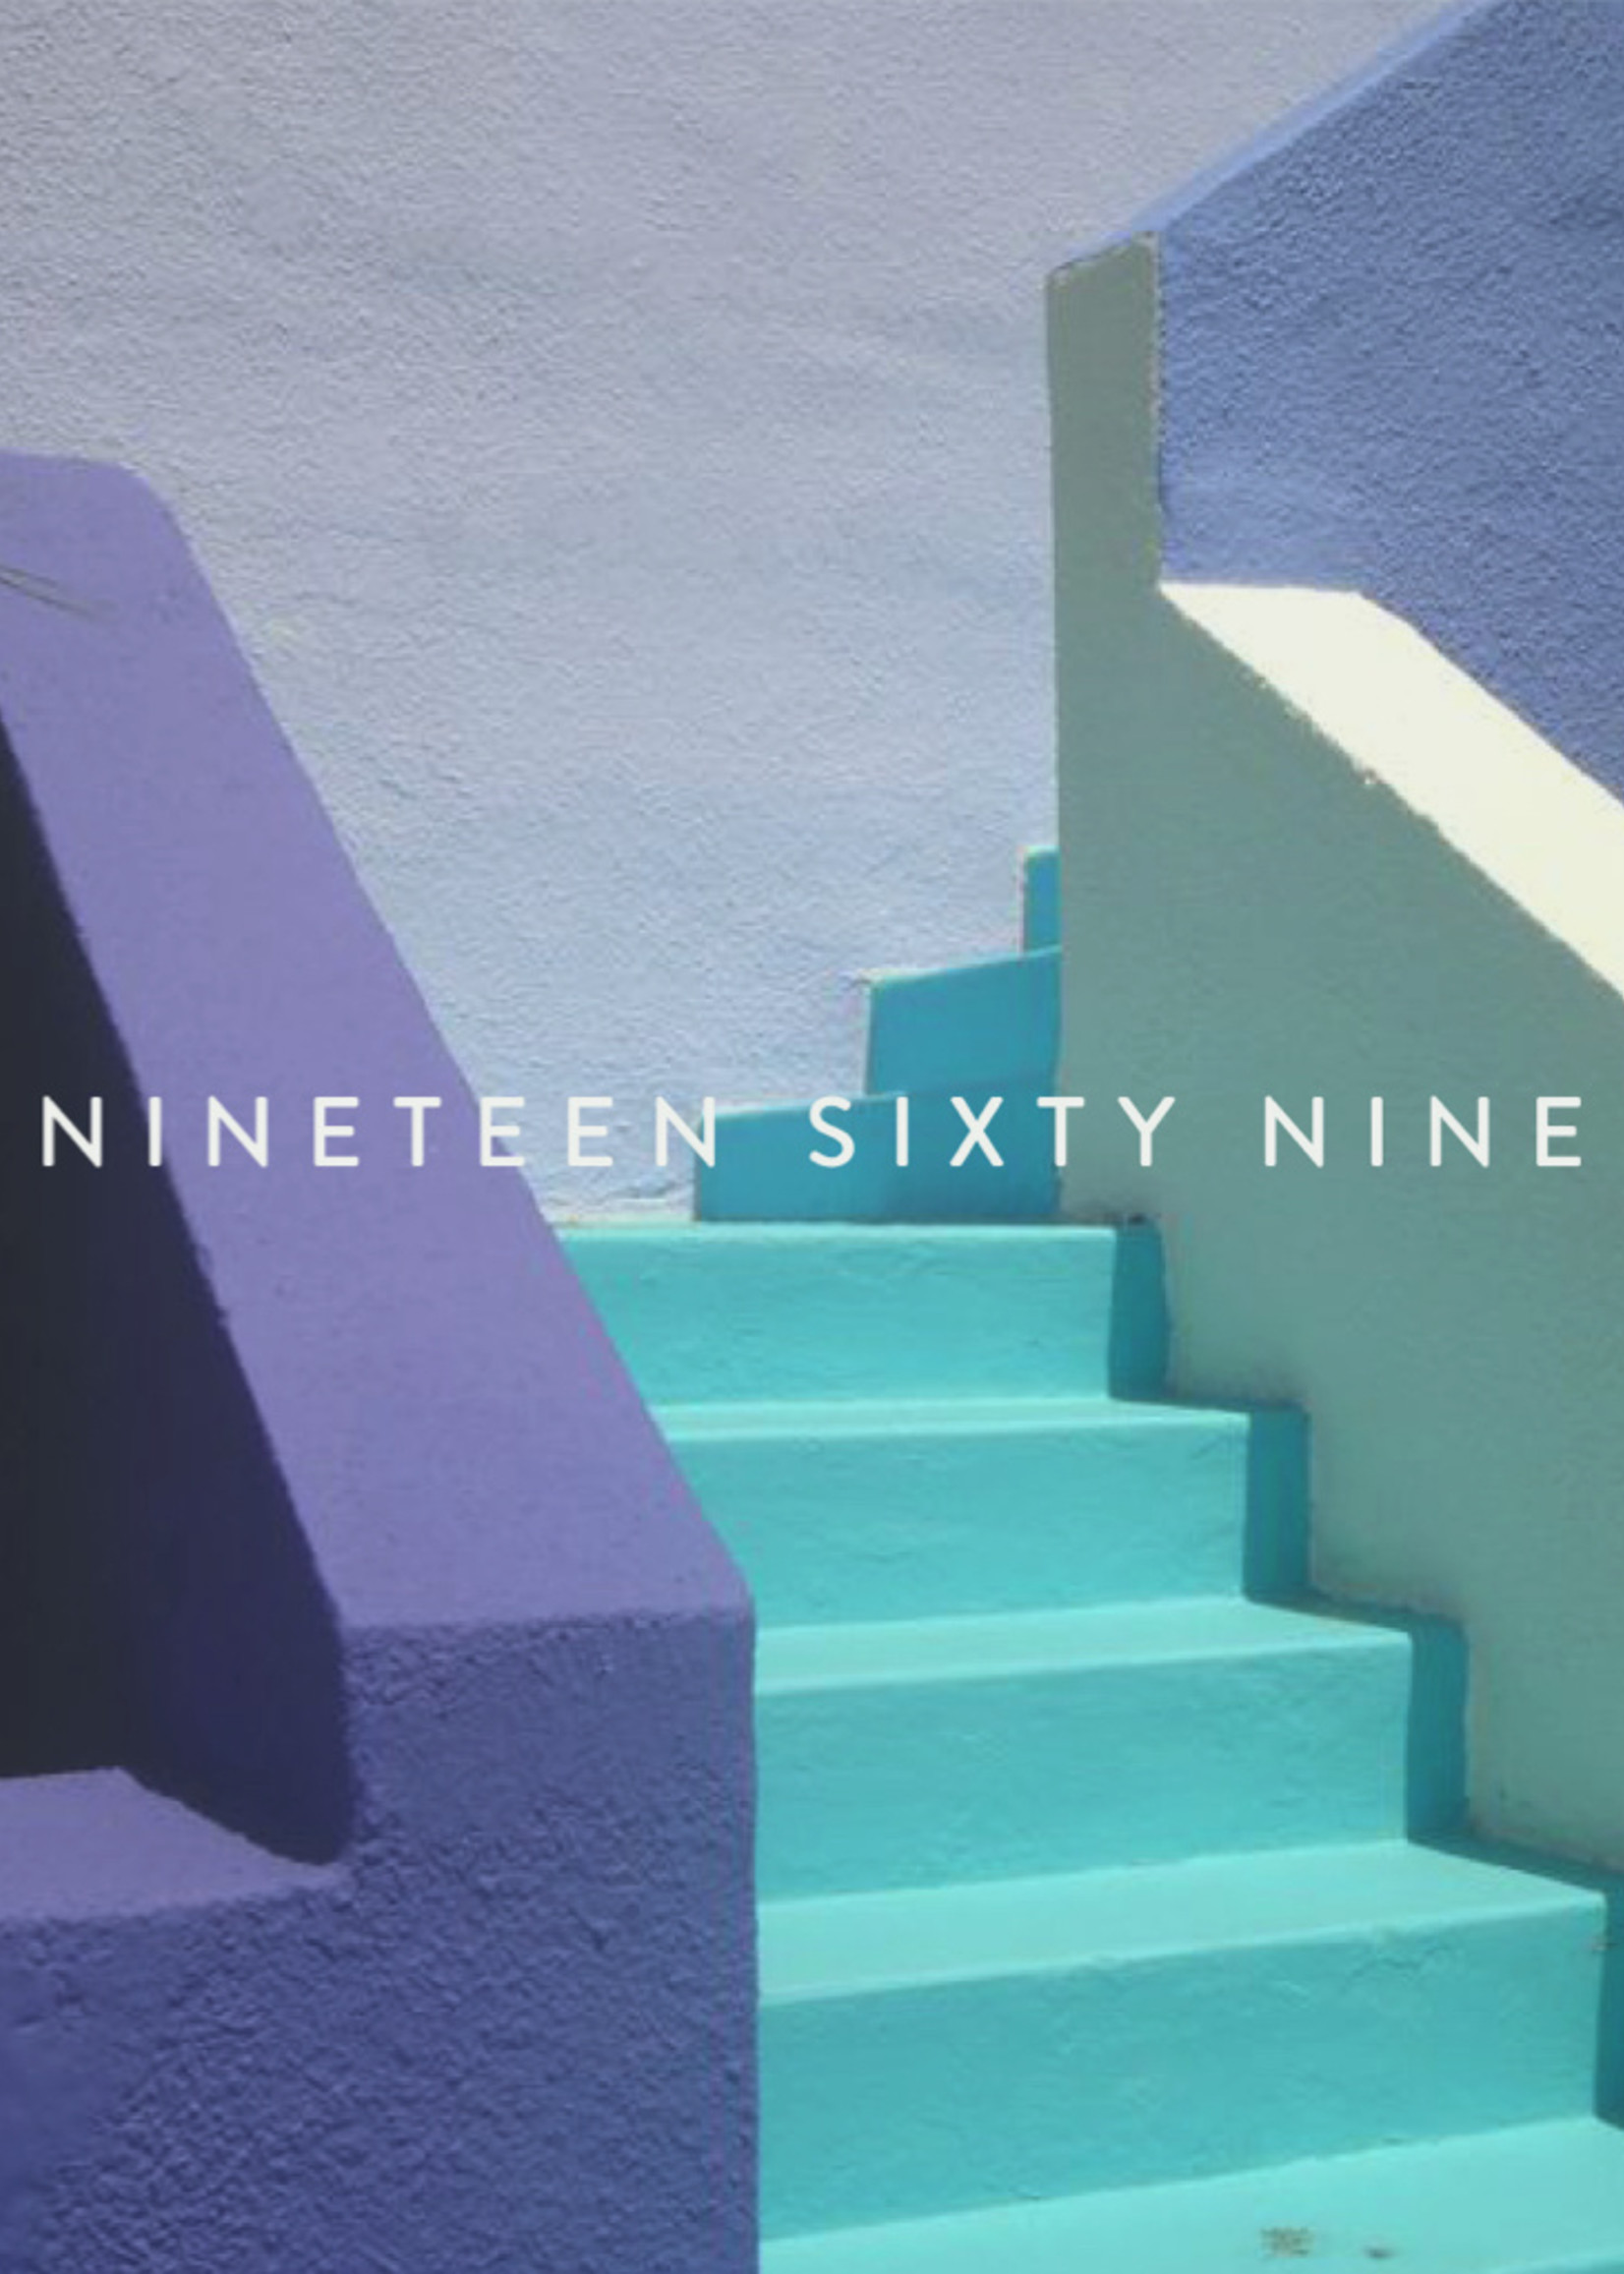 Nineteen Sixty Nine Nineteen Sixty Nine - Miami Blue - Eau de Parfum